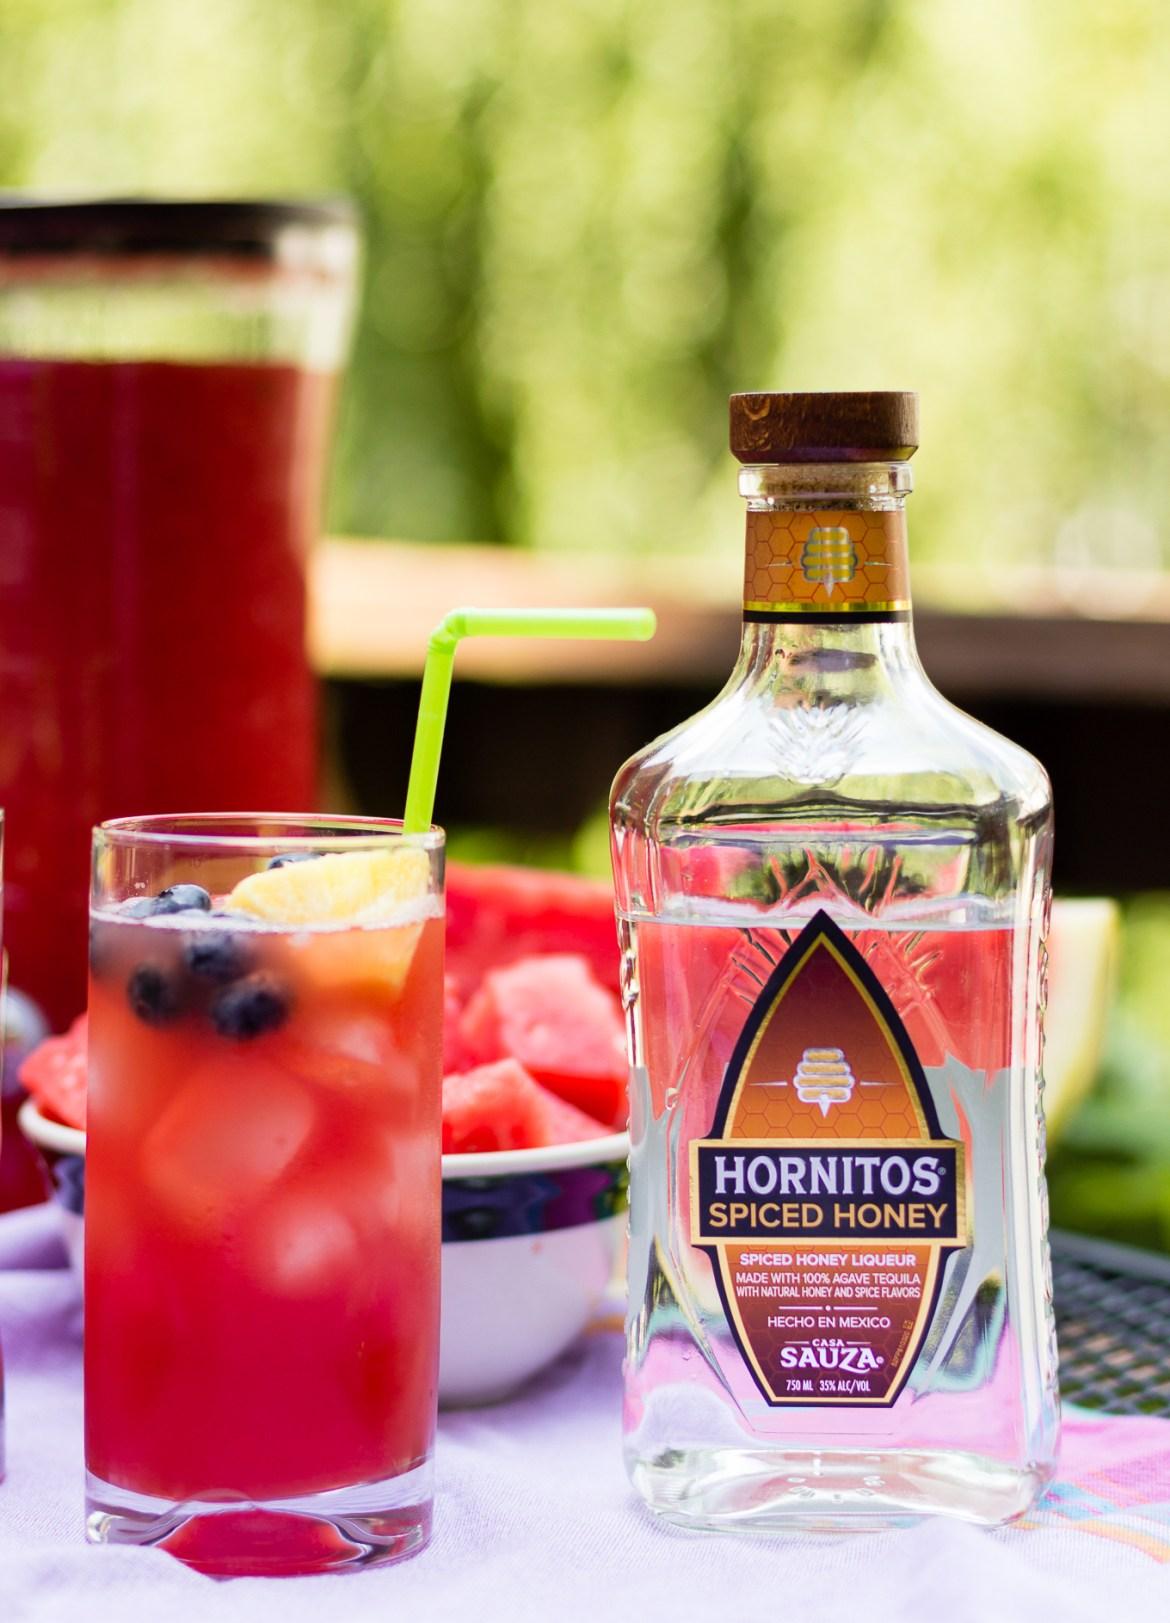 tex mex brunch, tex mex, brunch, hornitos, hornitos tequila, brunch cocktails